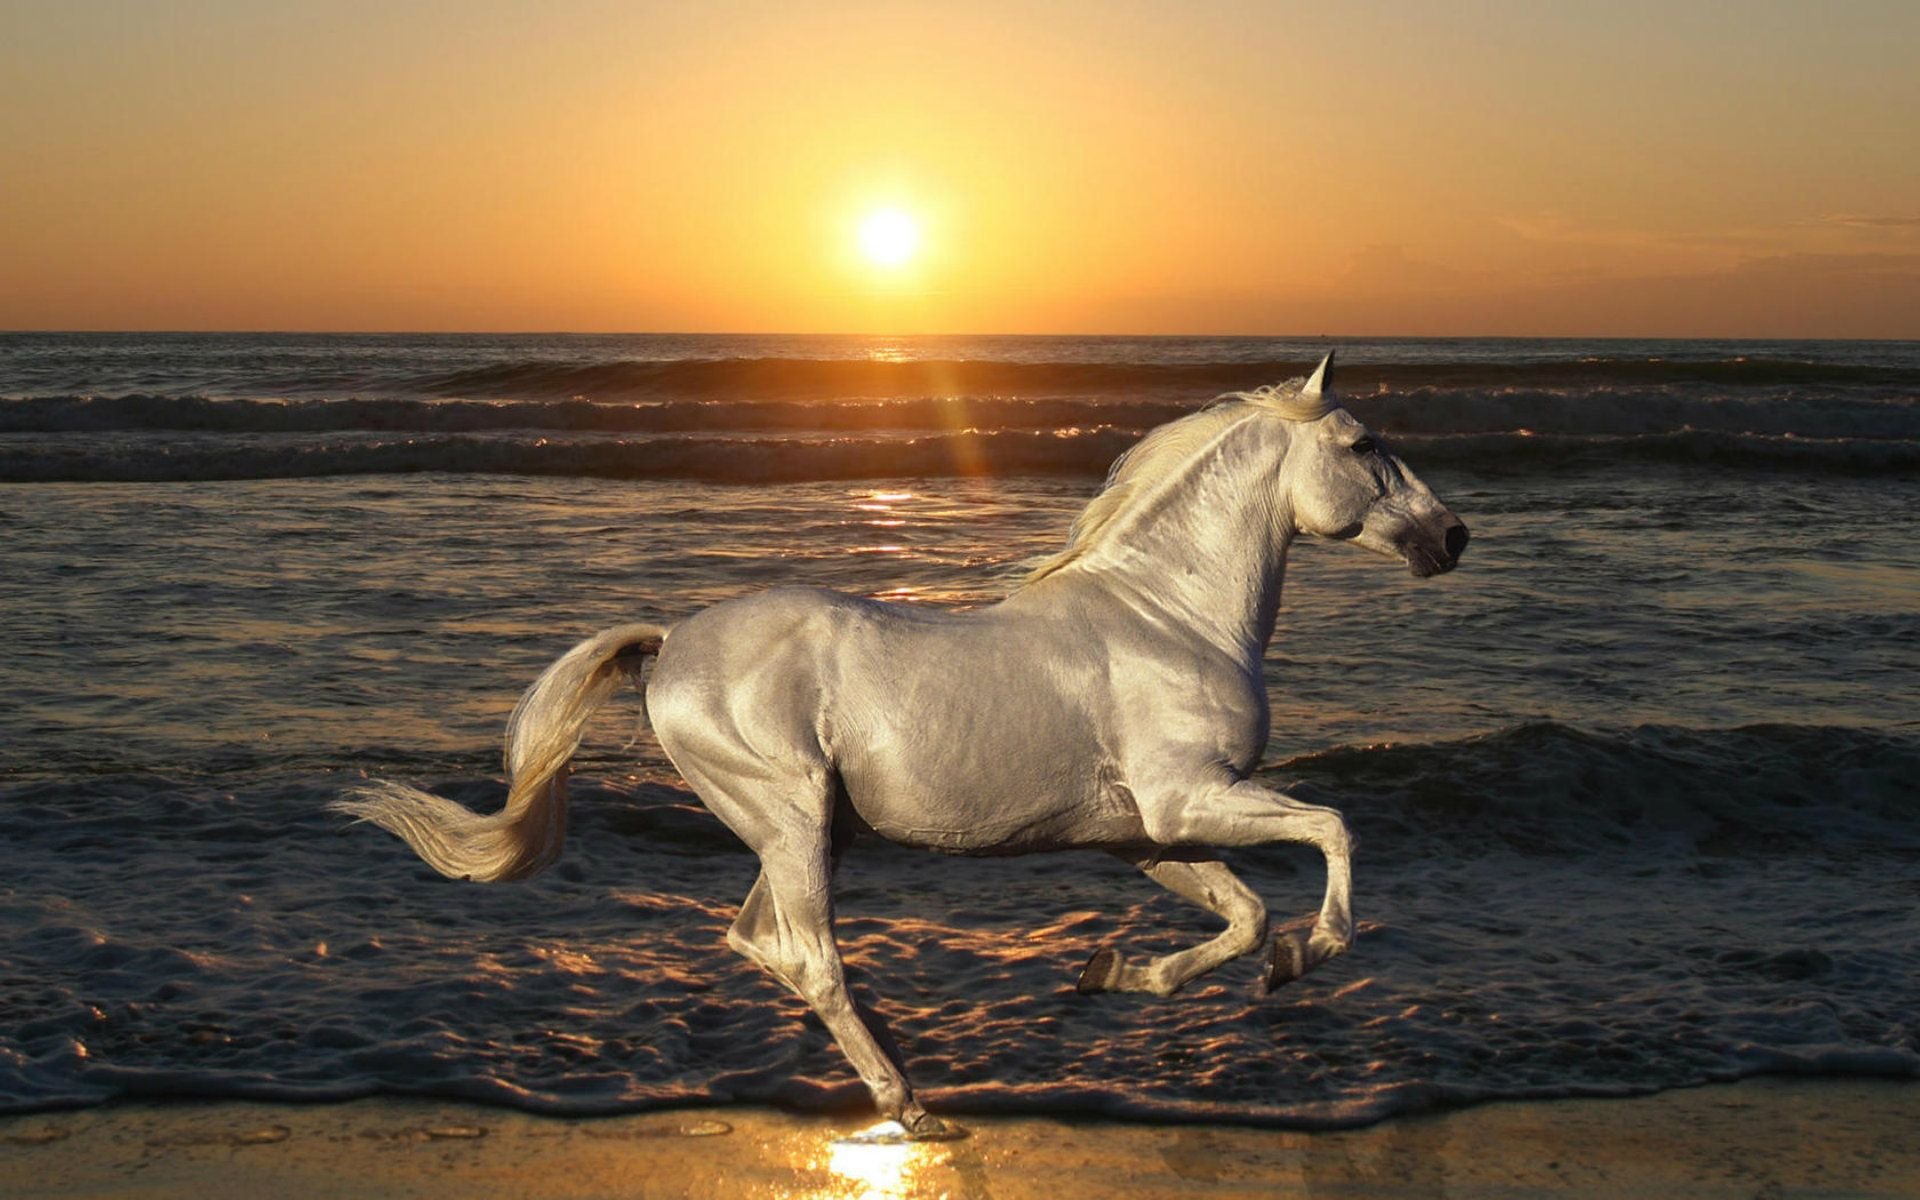 Beautiful Wallpaper Horse Android - b4e224c26e5f5c12cb0ff2a41521b9fb  Collection_68125.jpg